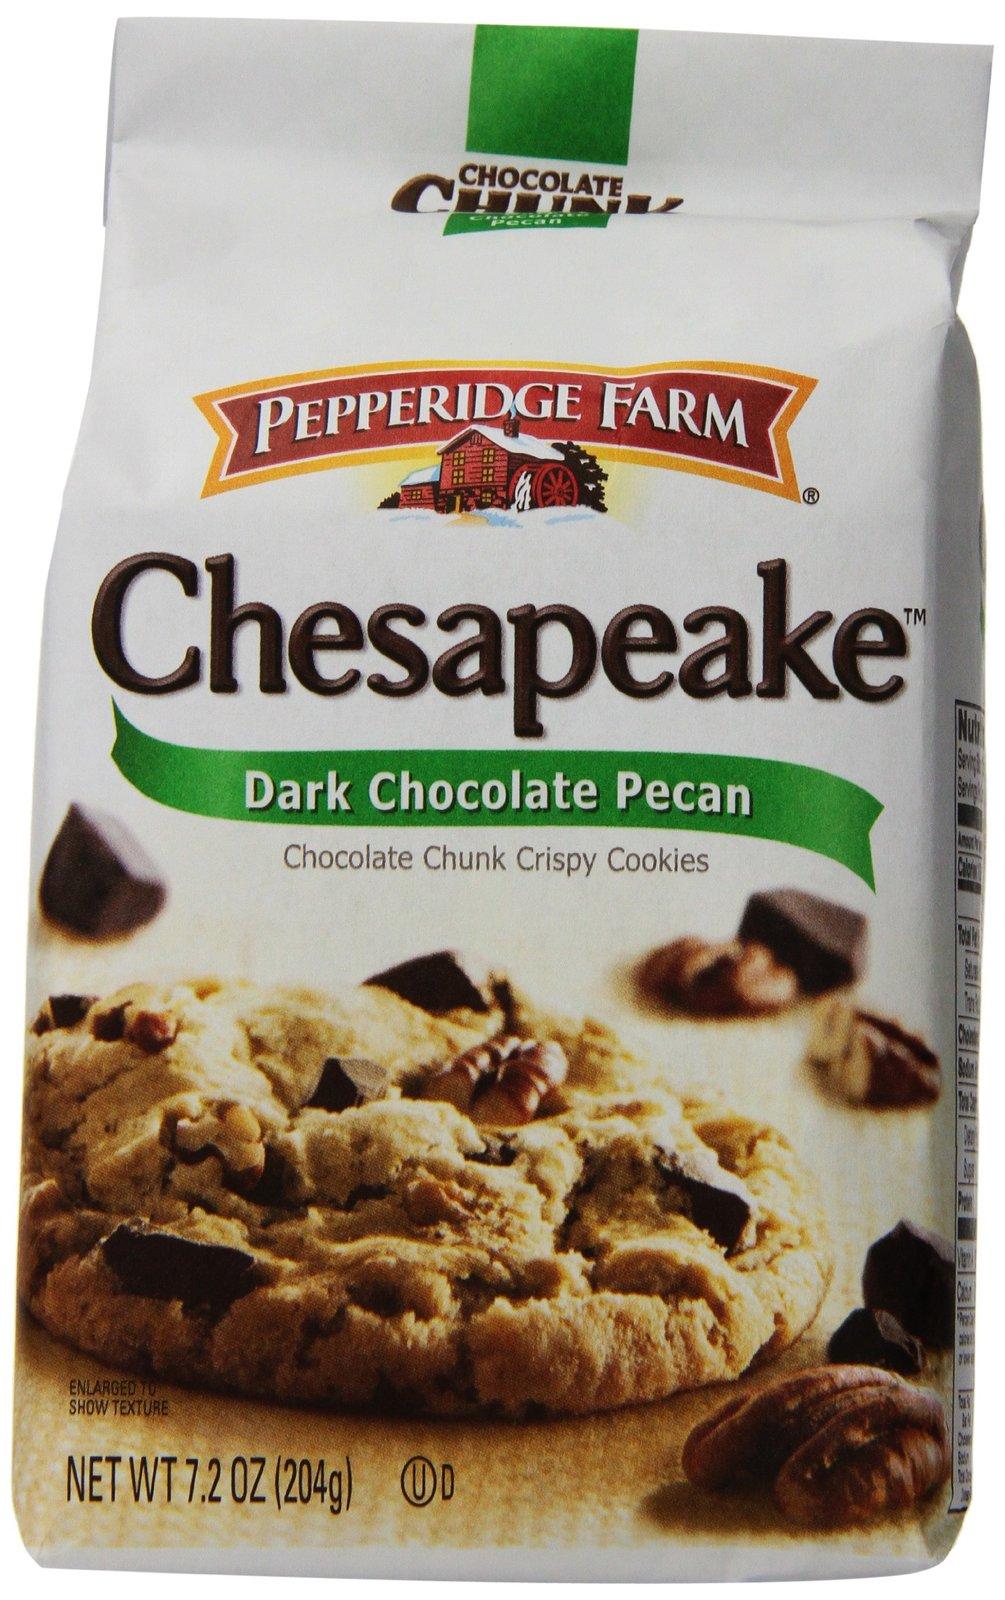 Pepperidge Farm Chesapeake, Crispy, Cookies, Dark Chocolate Pecan, 7.2 oz, Bag,  image 2